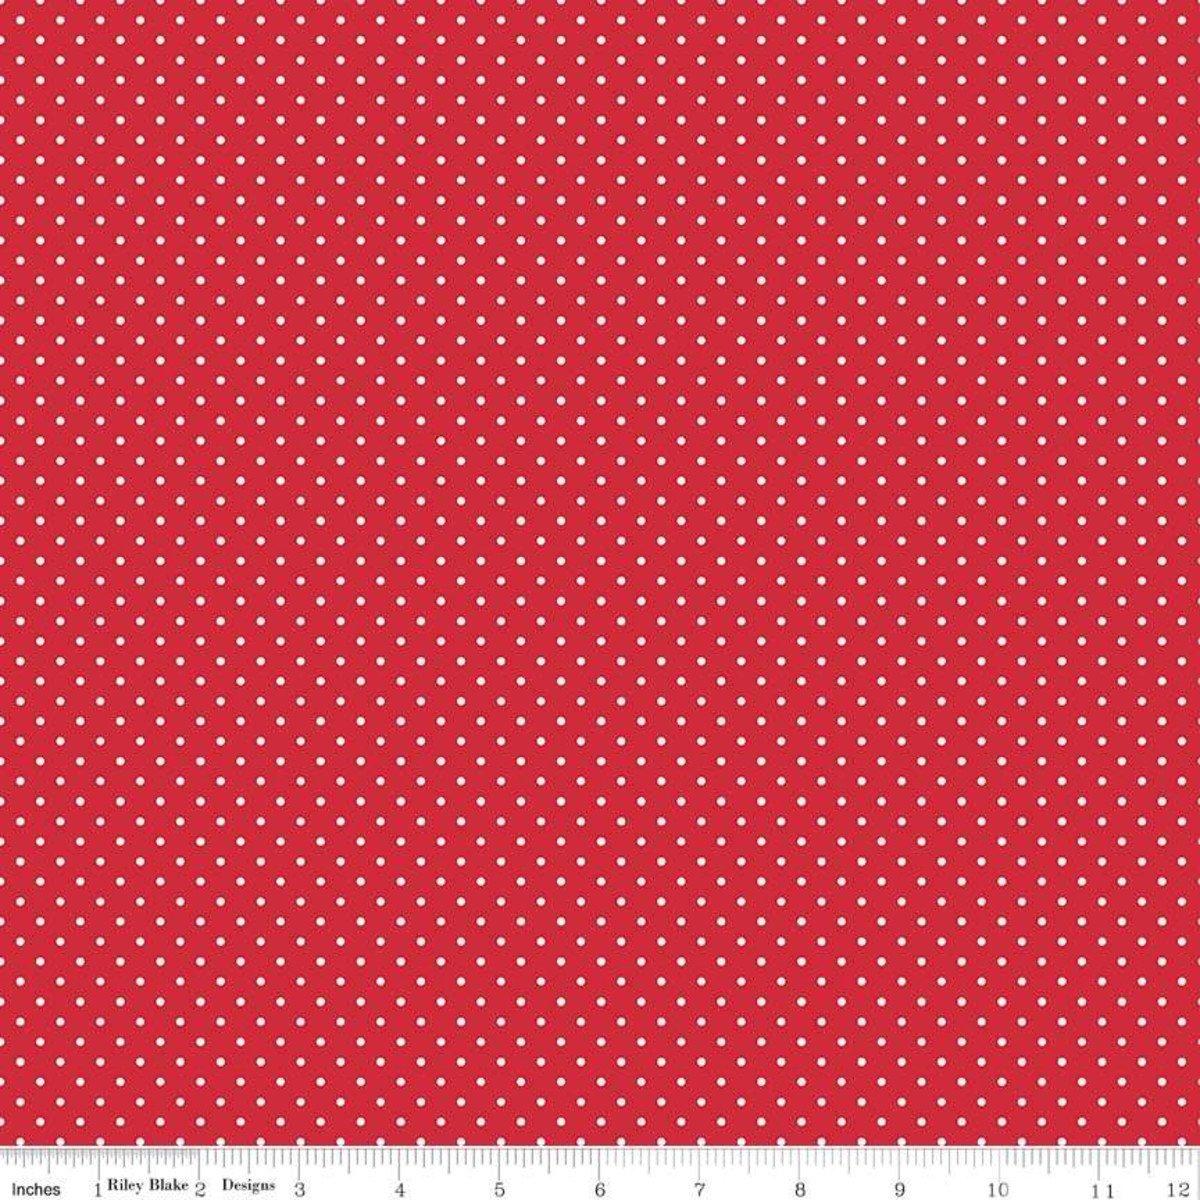 Riley Blake Designs, Swiss Dot - Swiss Dot Red